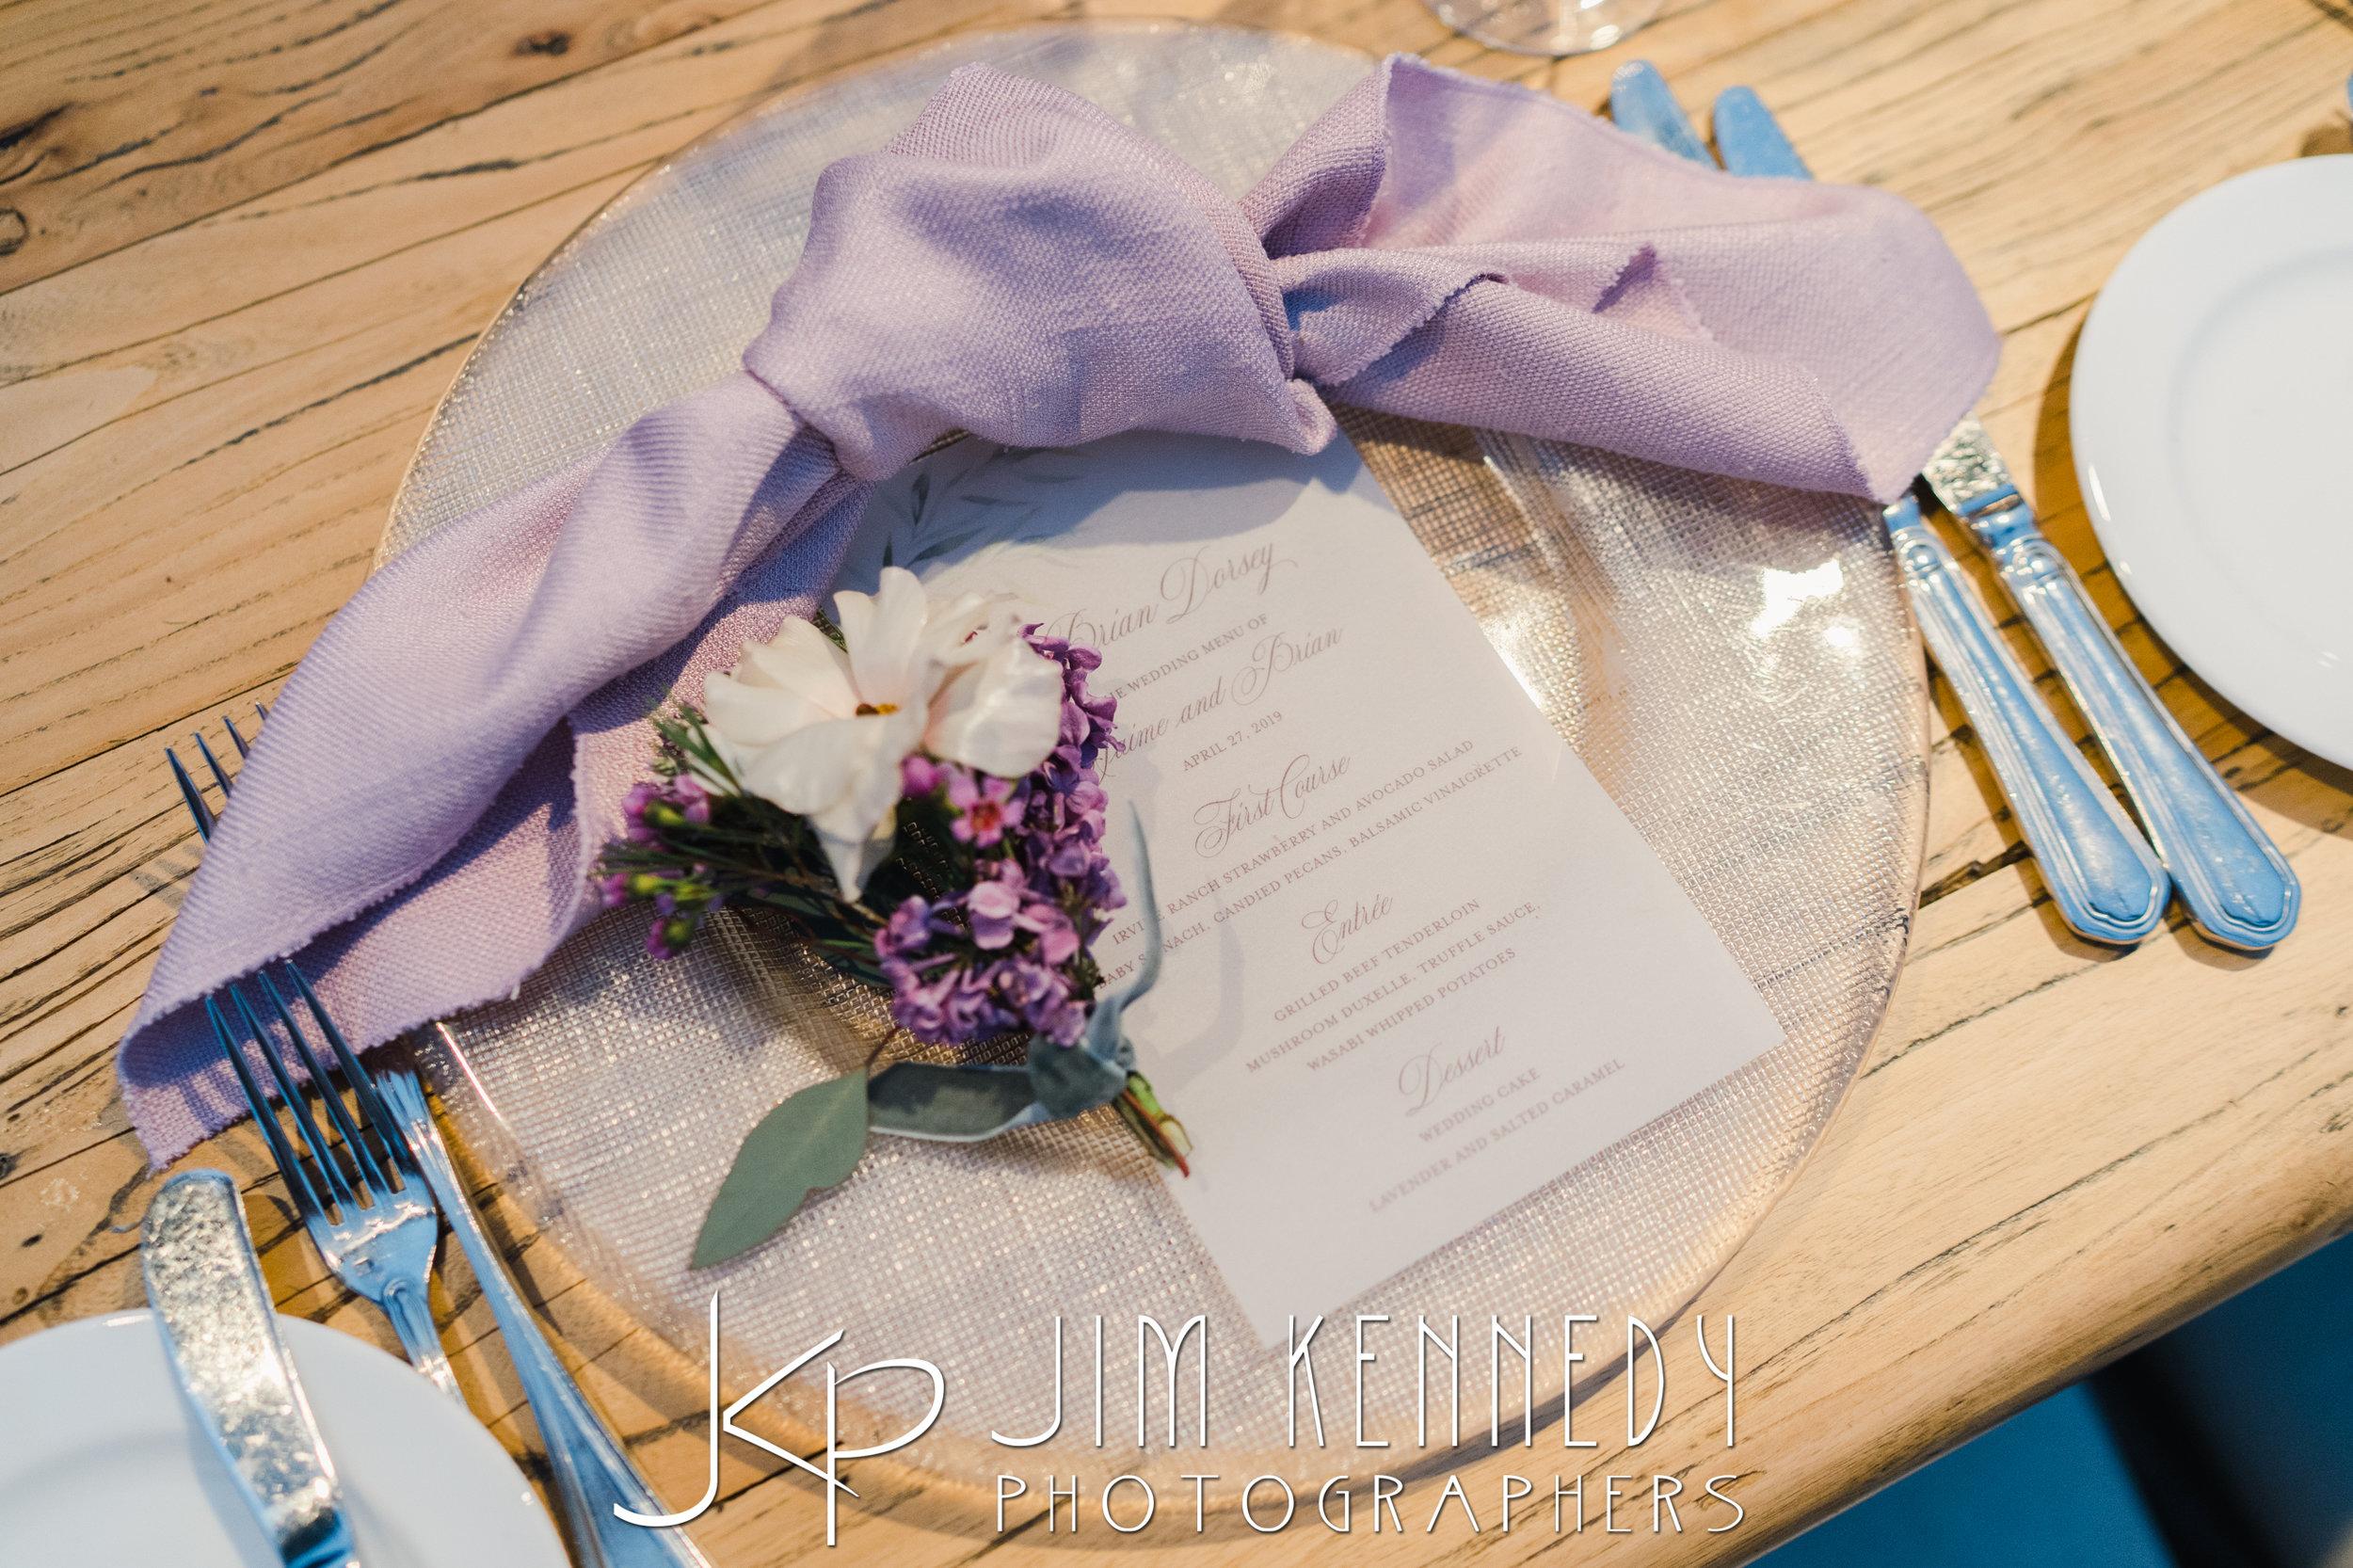 pelican-hill-wedding-jim-kenedy-photographers_0214.JPG